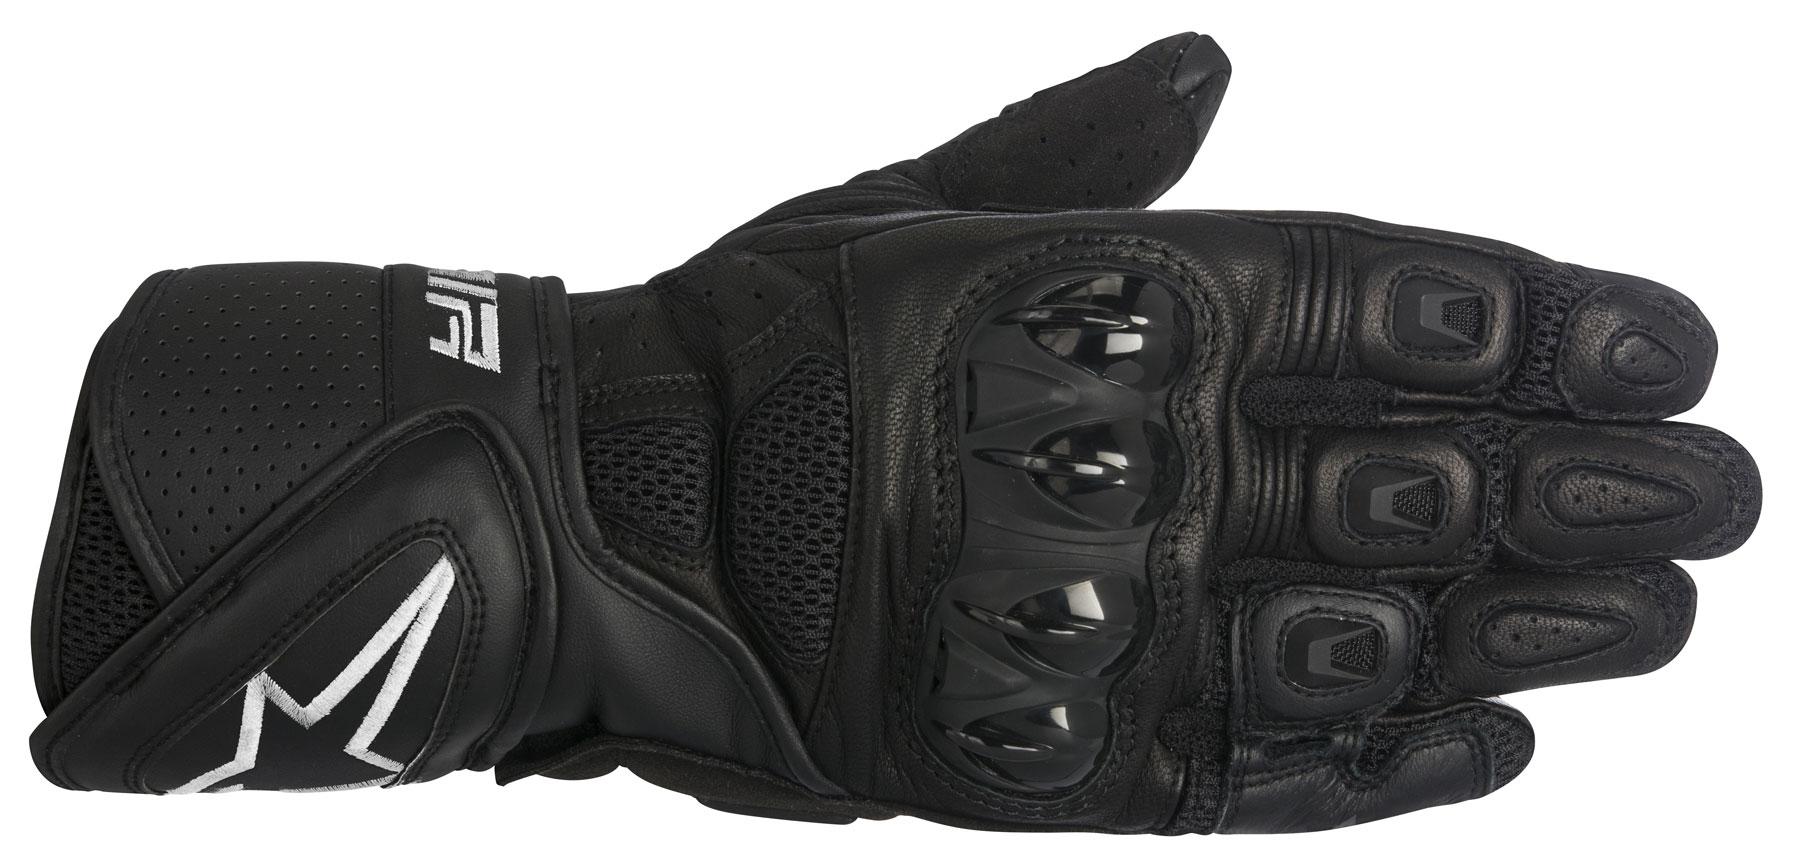 Alpinestars SP AIR Leather/Mesh Gloves (Black)